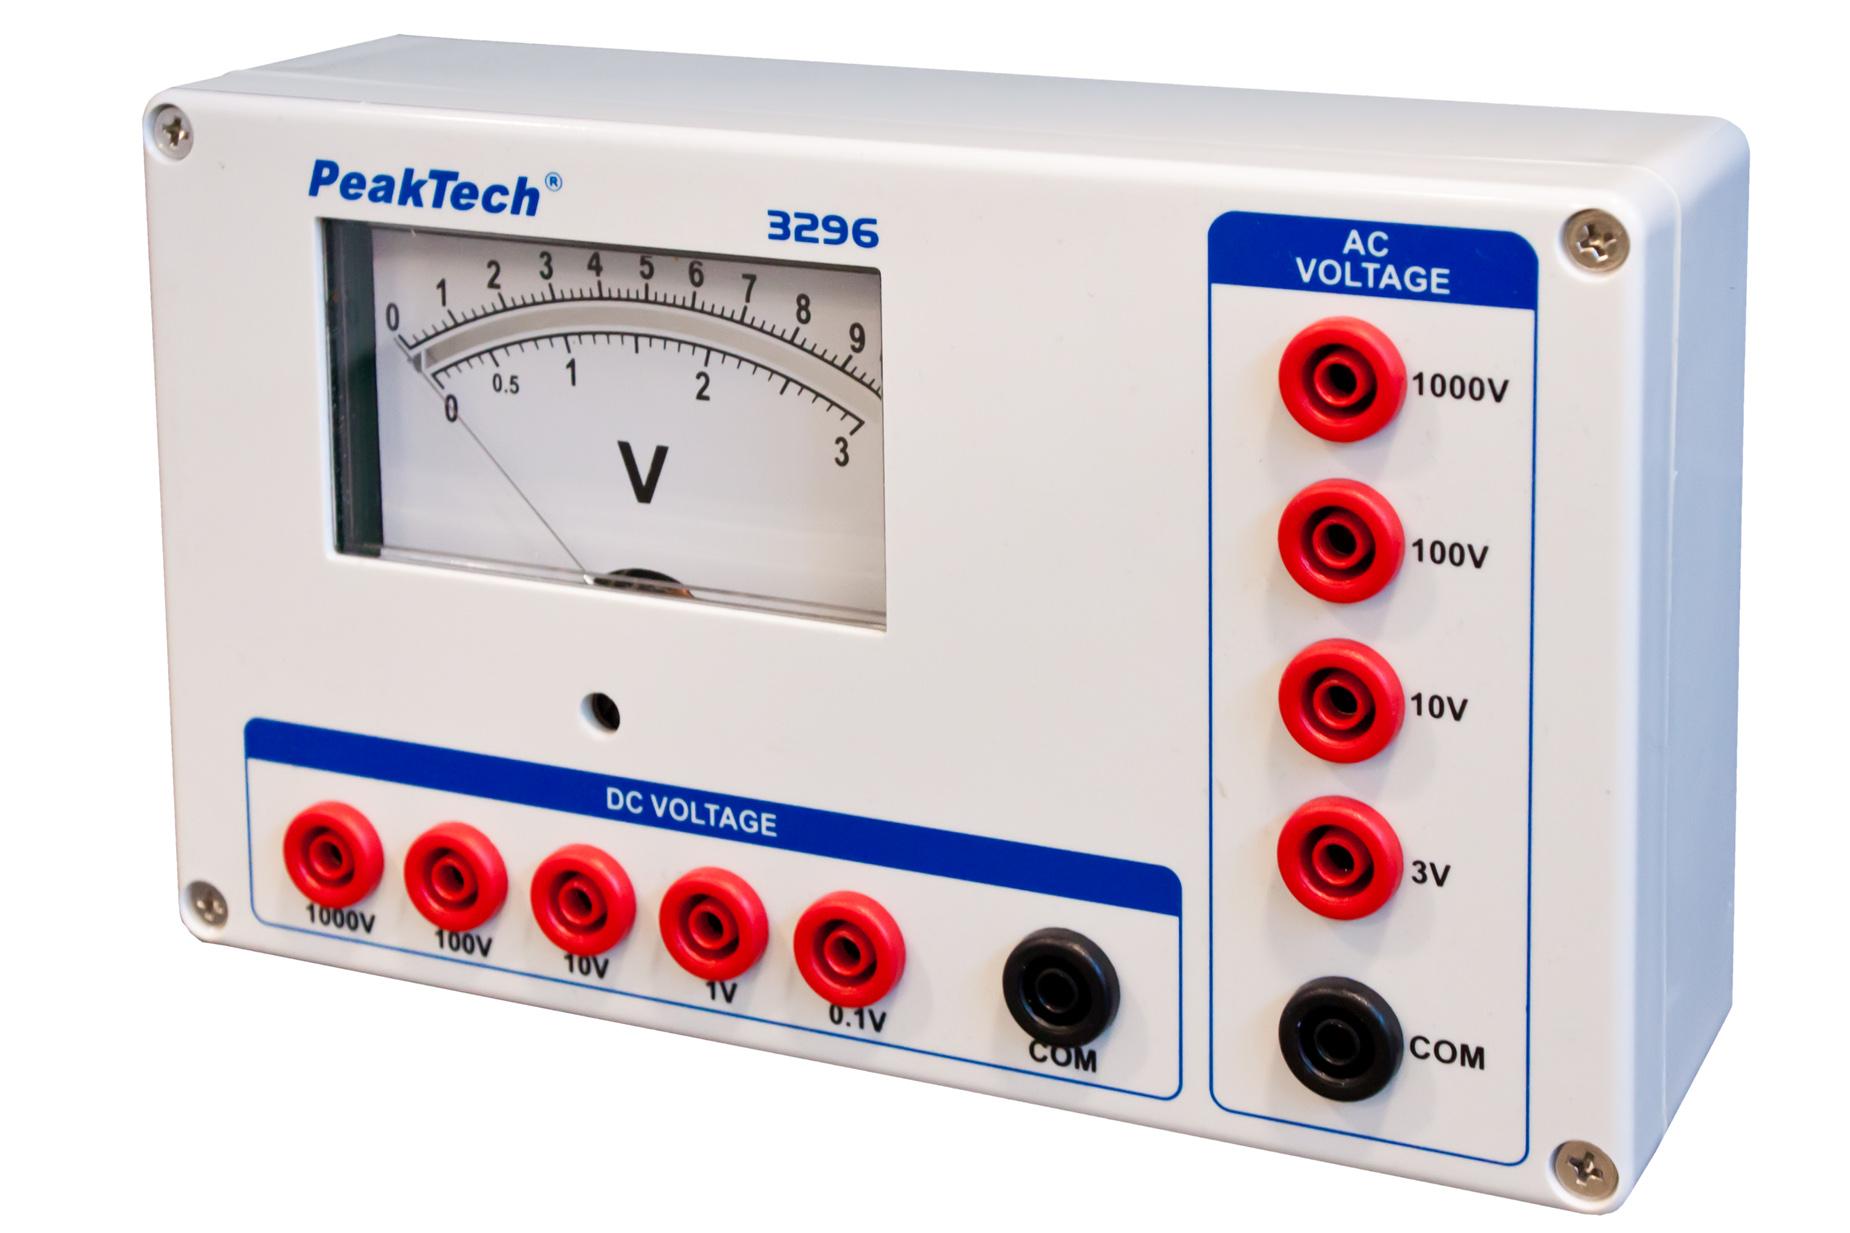 «PeakTech® P 3296» Analog voltmeter, 0 ... 0.1/1/10/100 / 1000V AC/DC